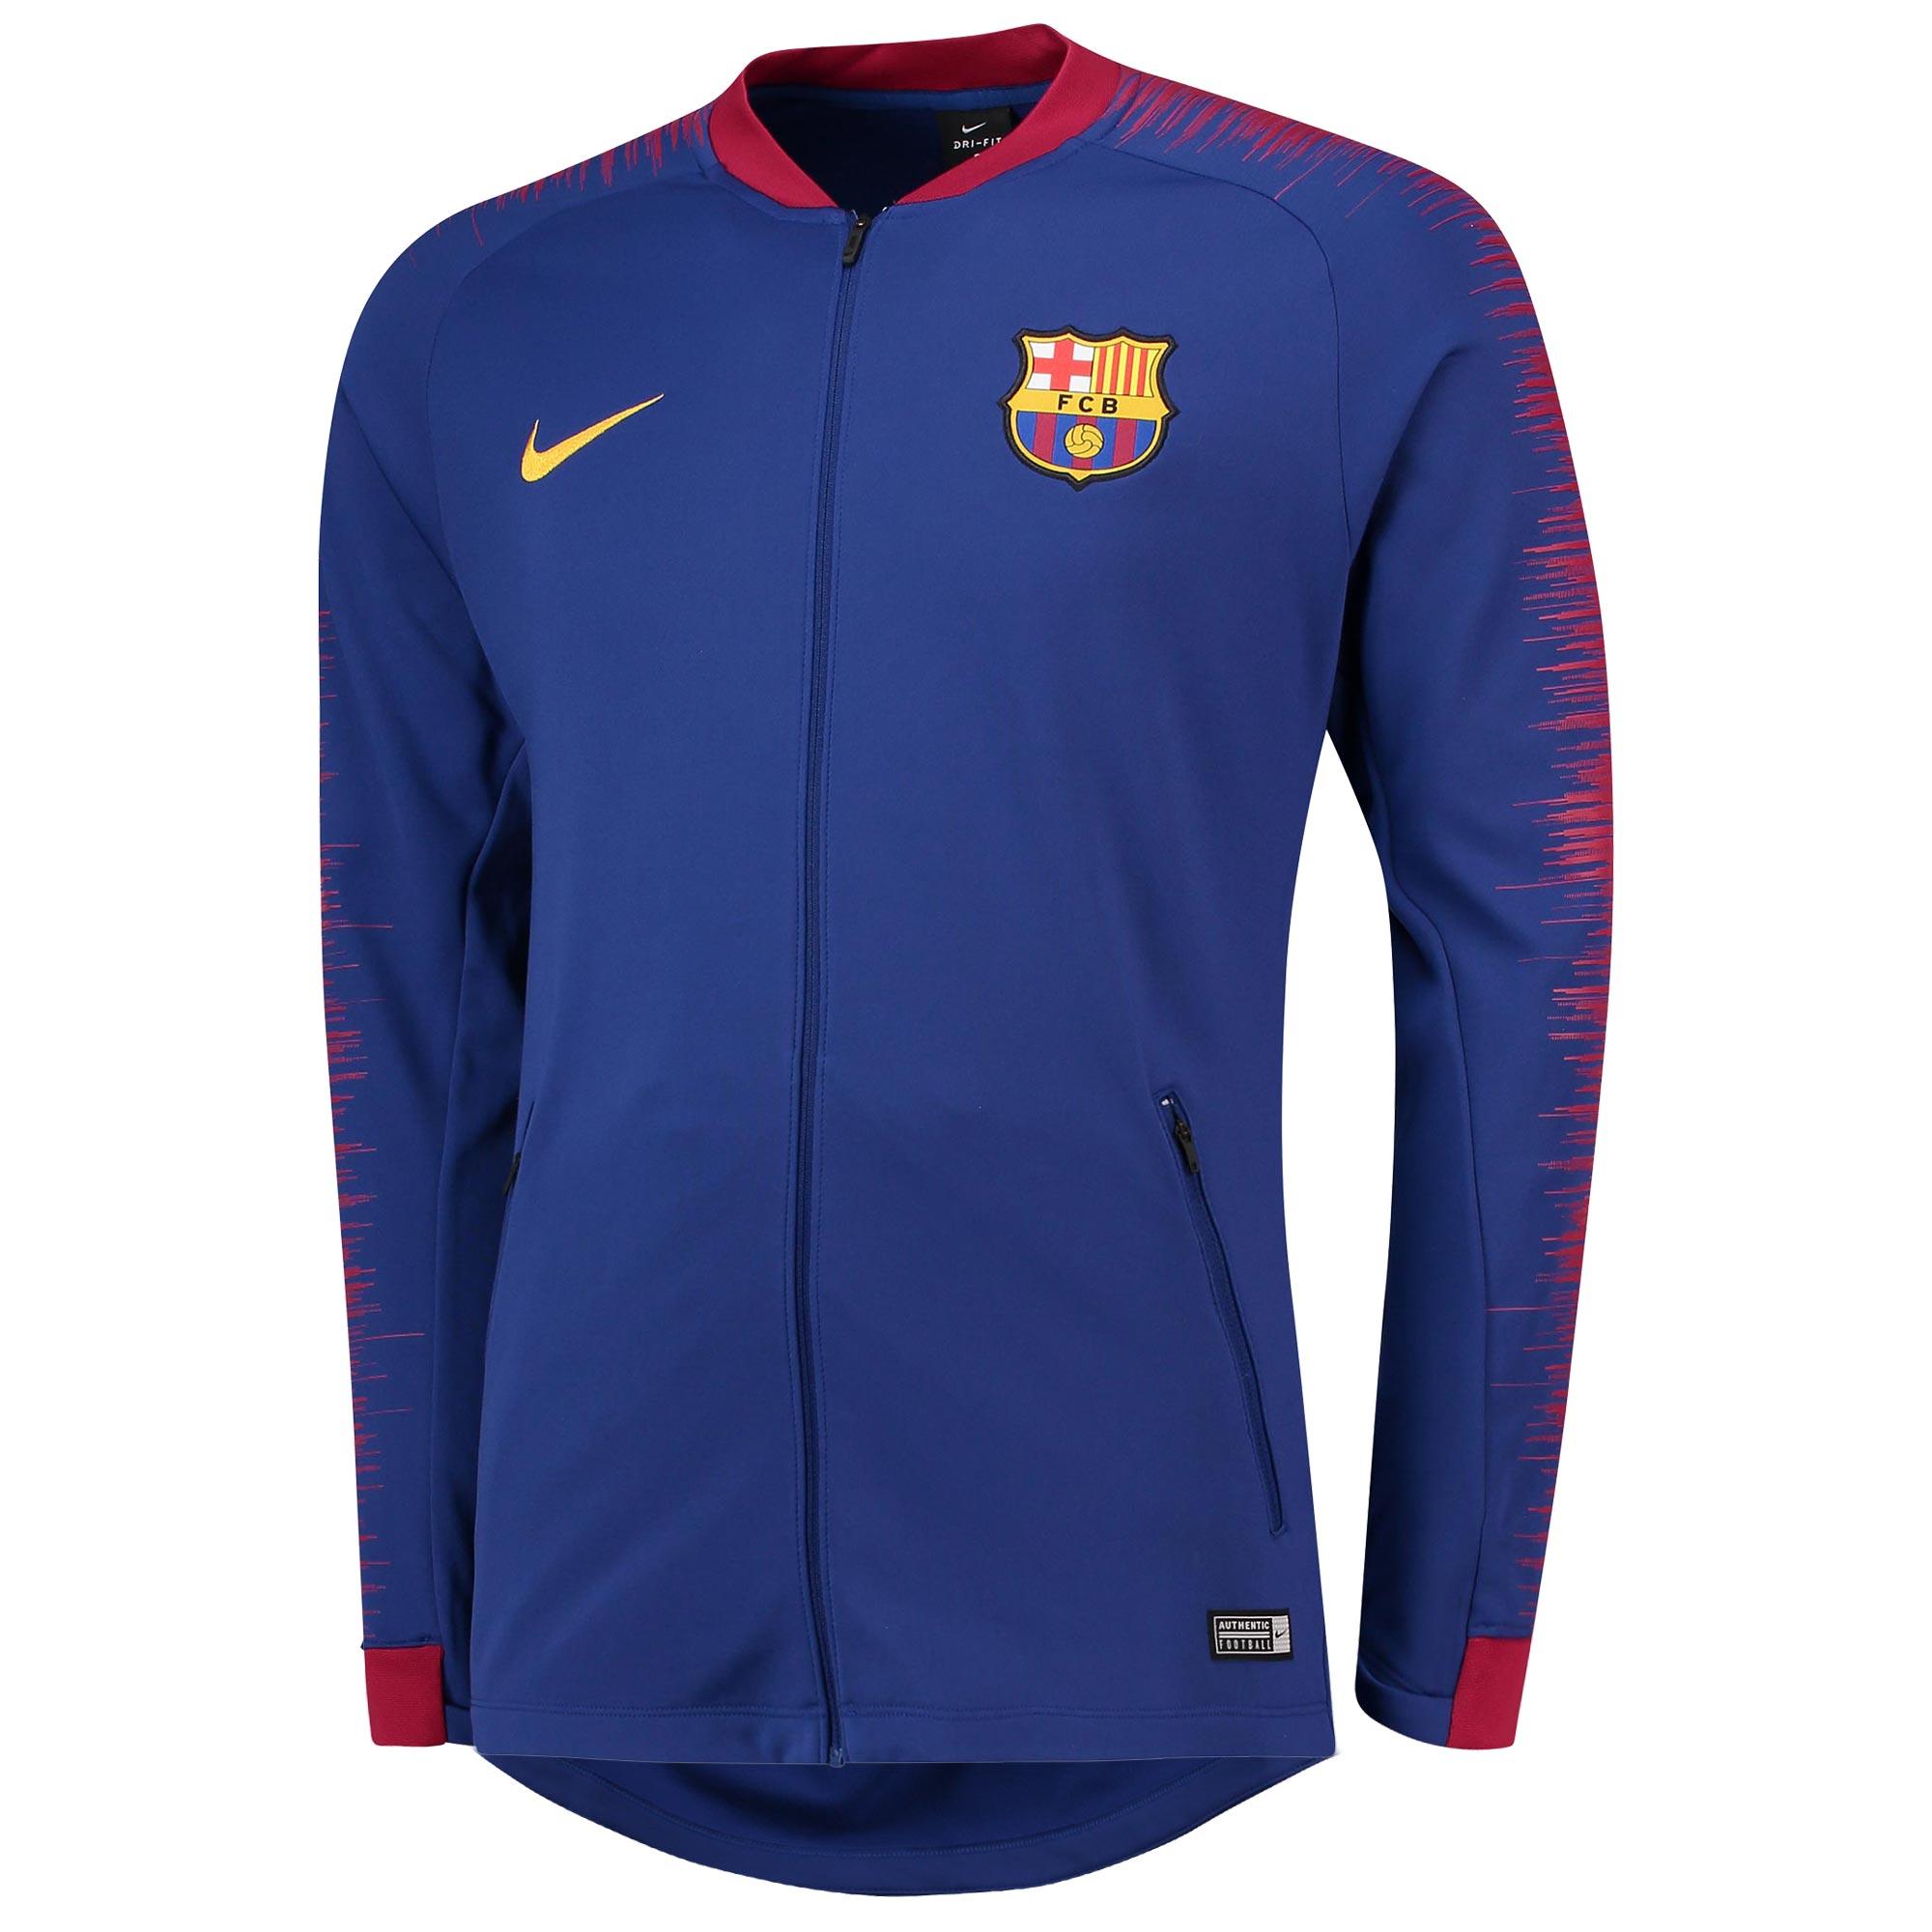 Nike FC Barcelona mikina   bunda modrá pánska 2018-2019 0afce68dae2